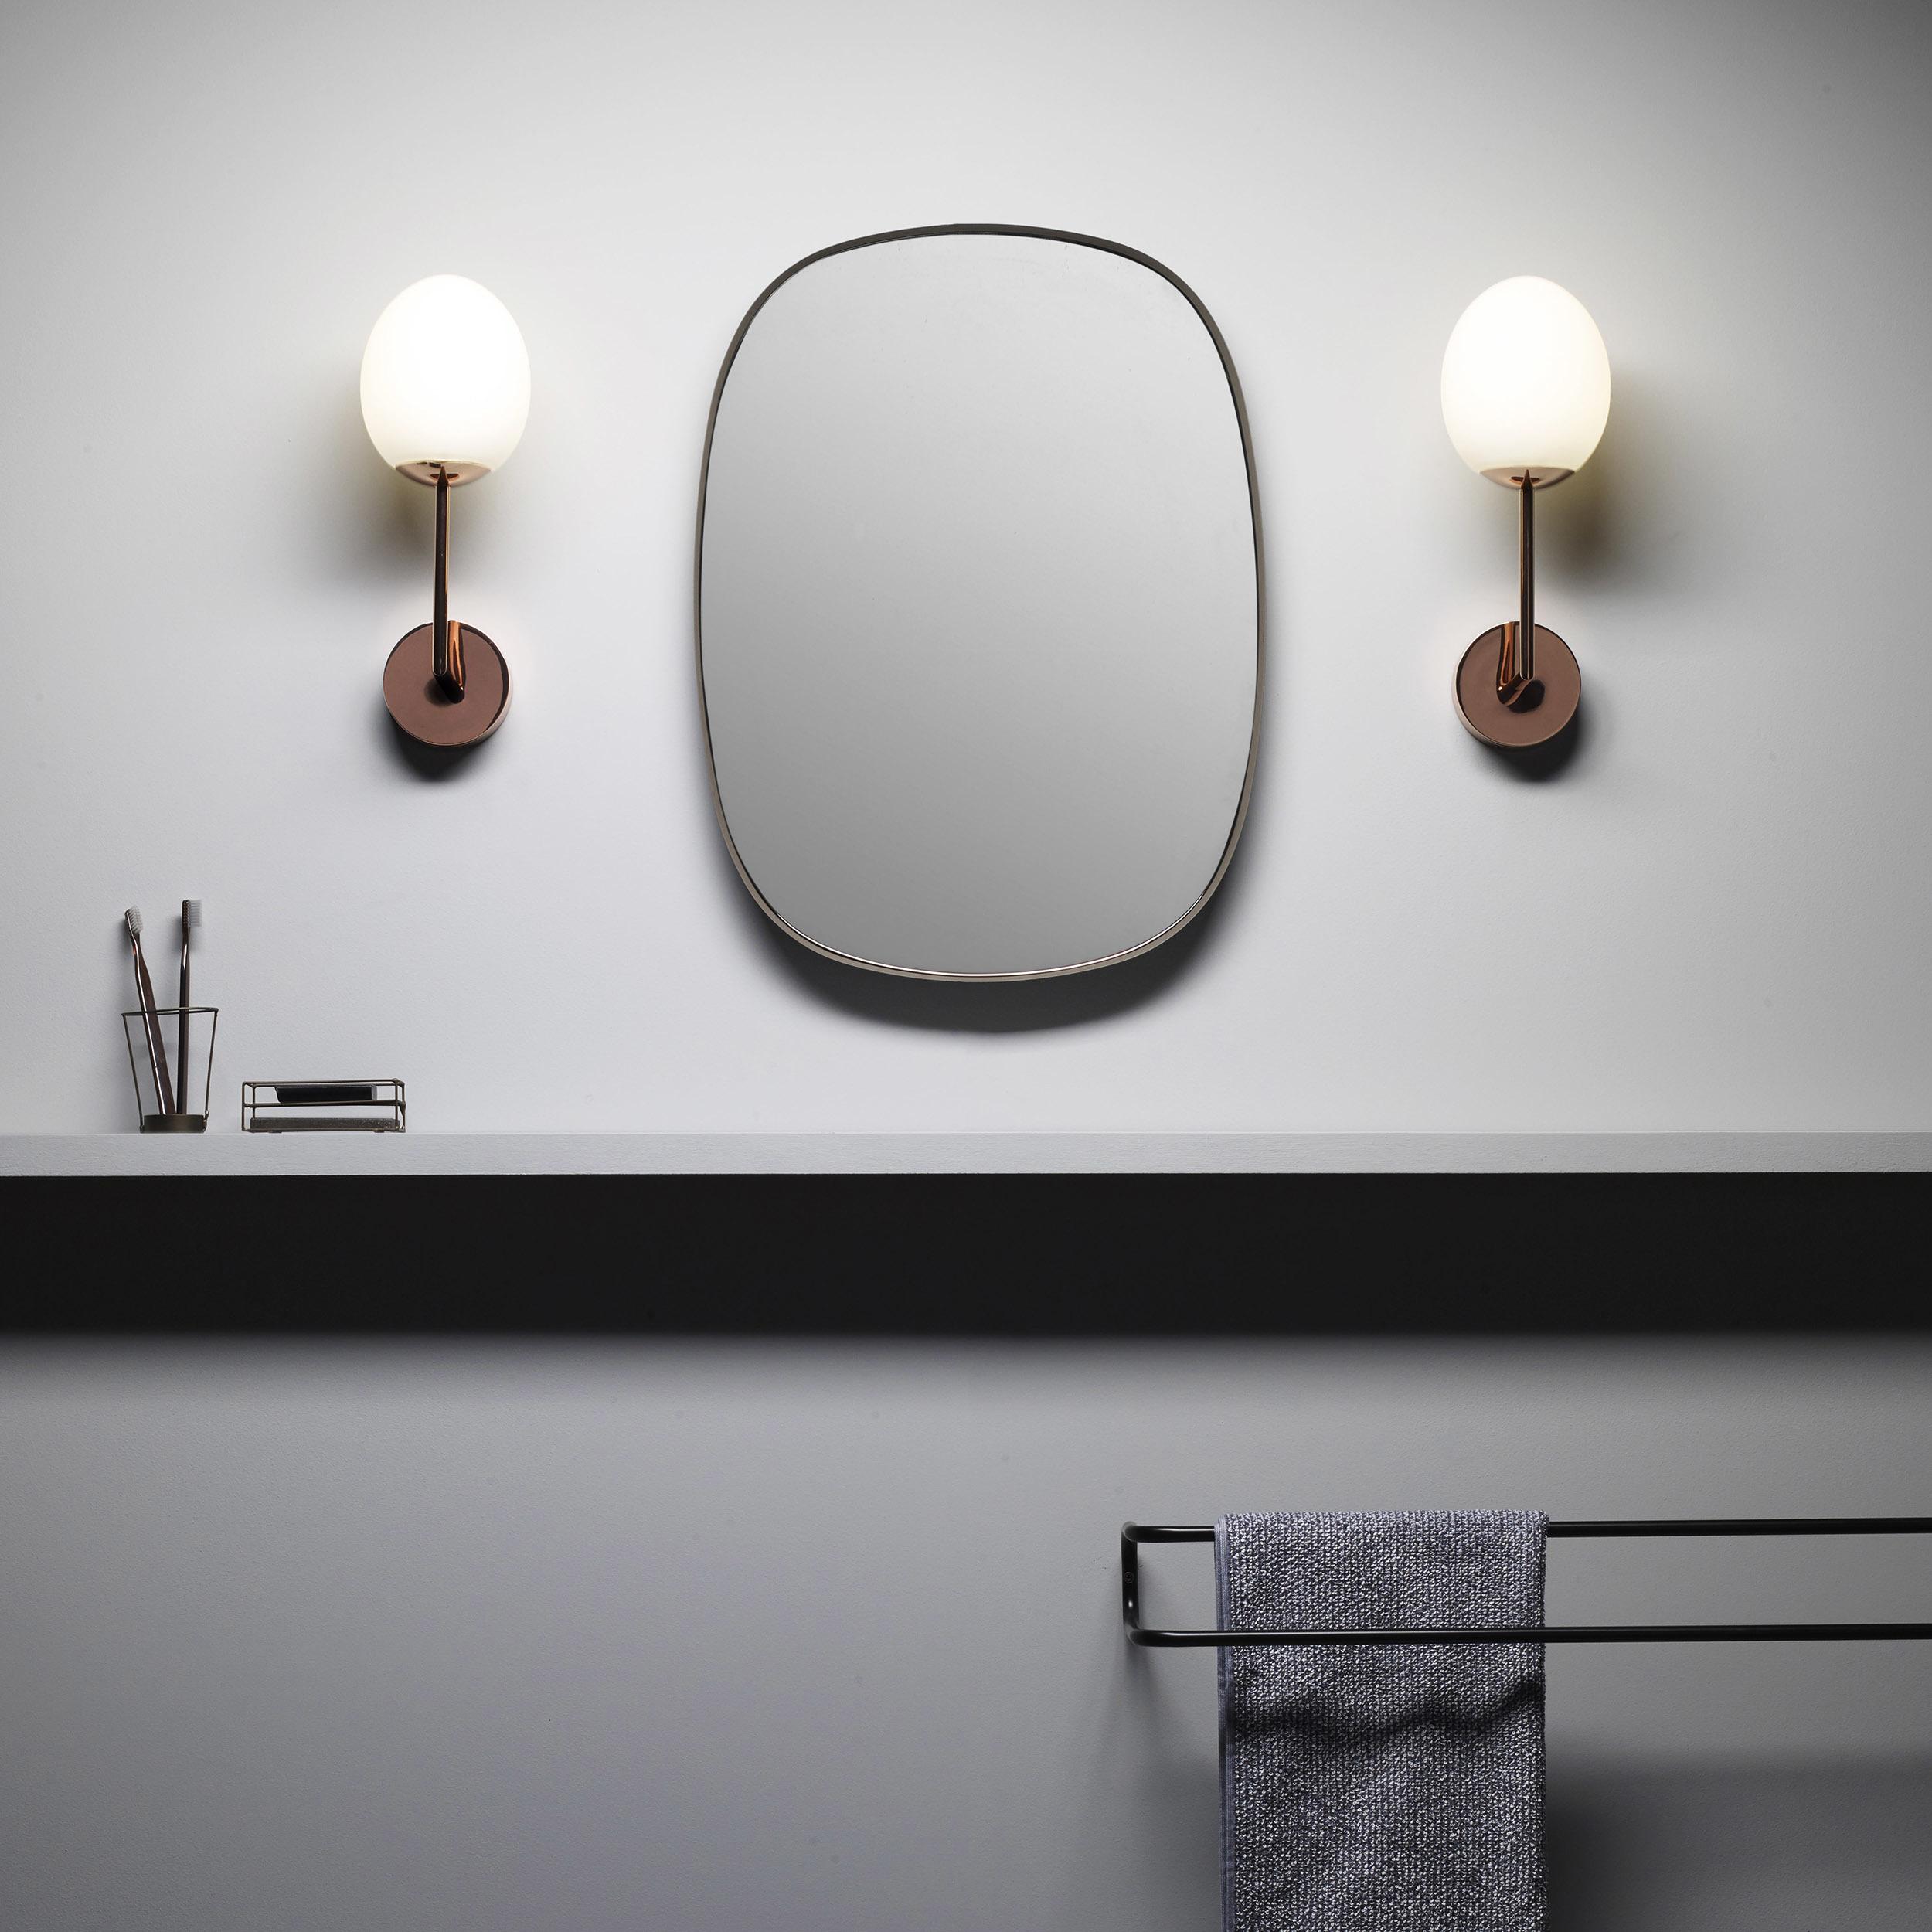 Светодиодное бра Astro Kiwi 1390003 (8010), IP44, LED 7,2W 2700K 567.4lm CRI80, хром, белый, металл, стекло - фото 5